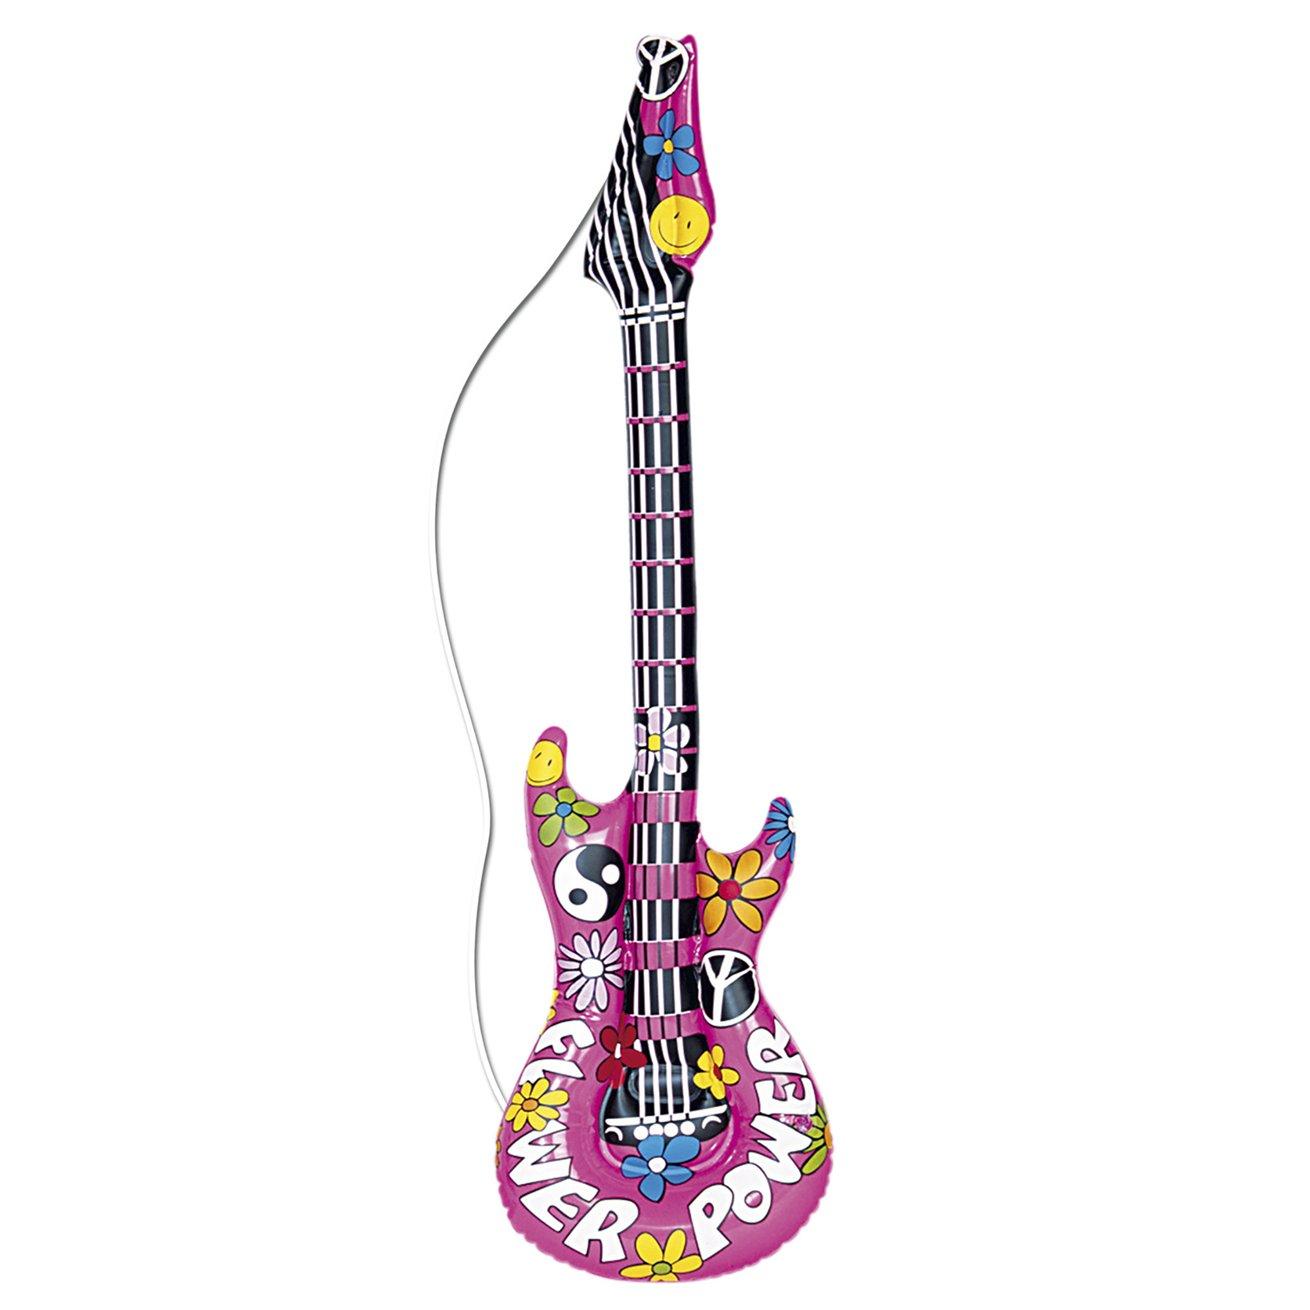 Widmann 23944 Aufblasbare Gitarre, One Size